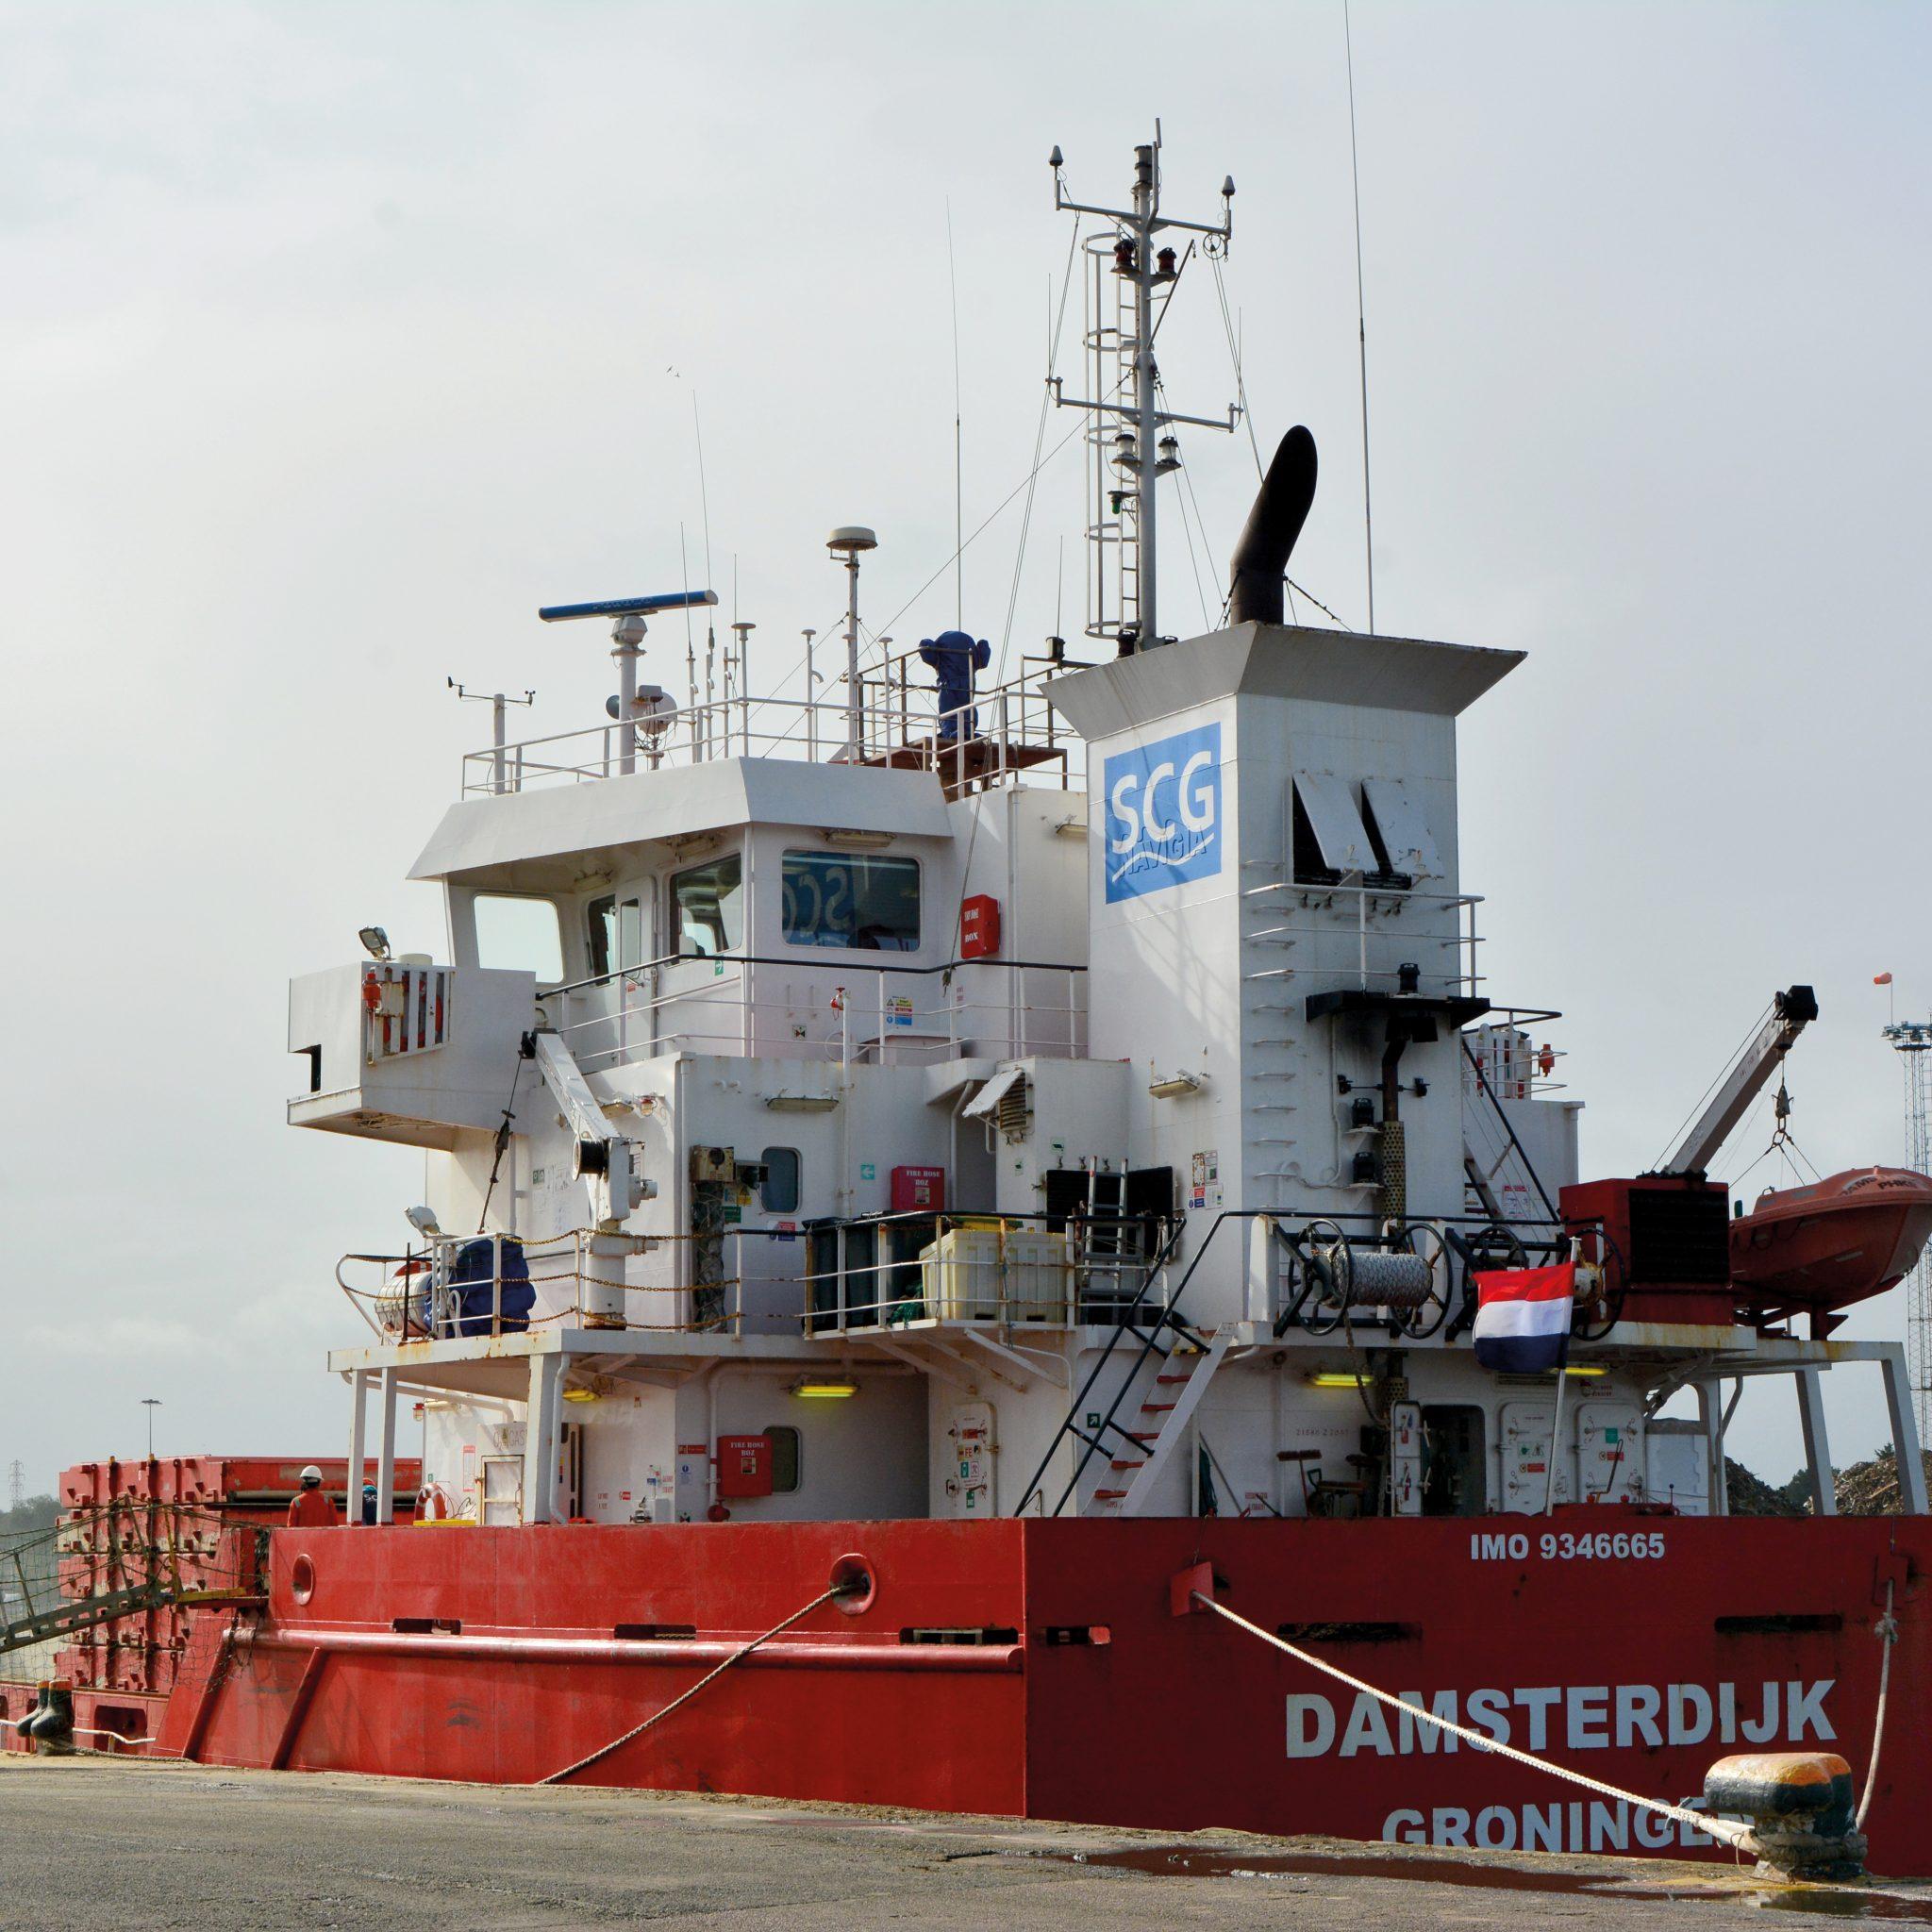 De Damsterdijk (Foto OVV)